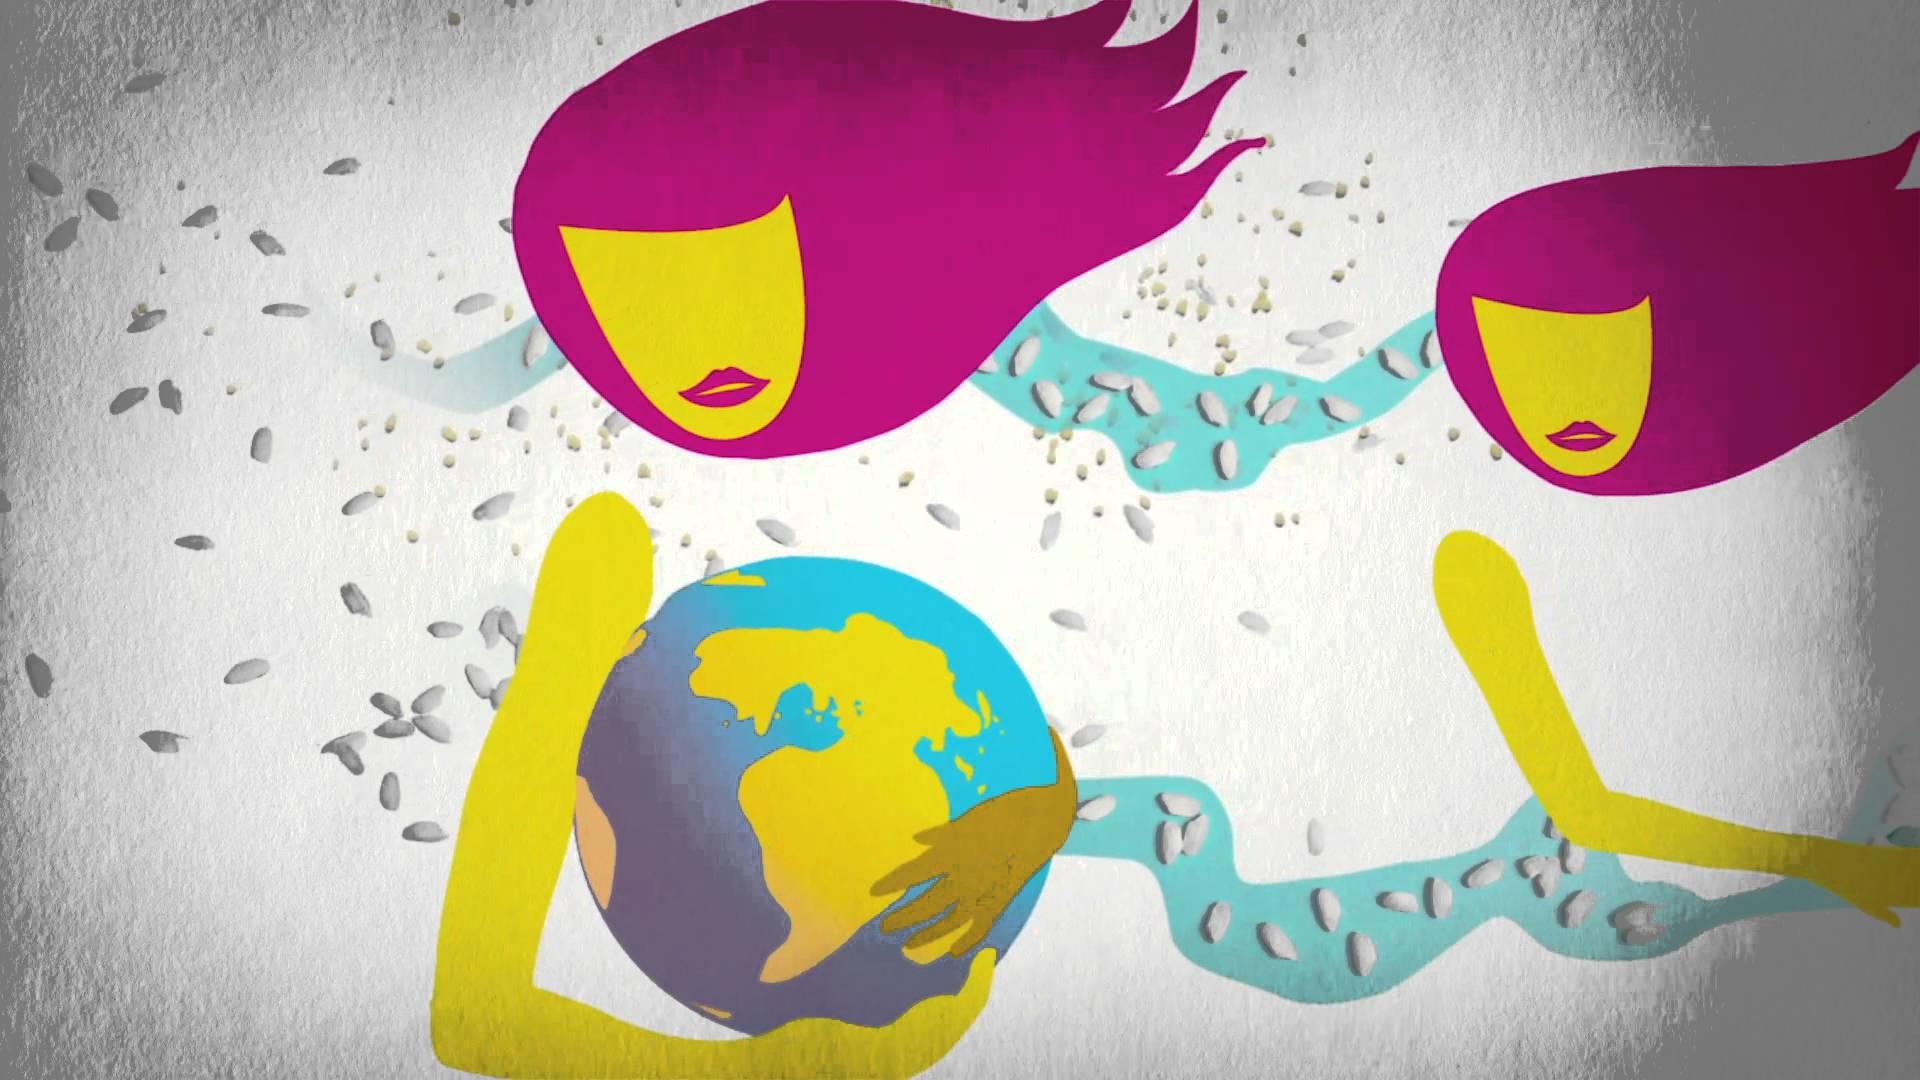 Expo 2015: Women for Expo